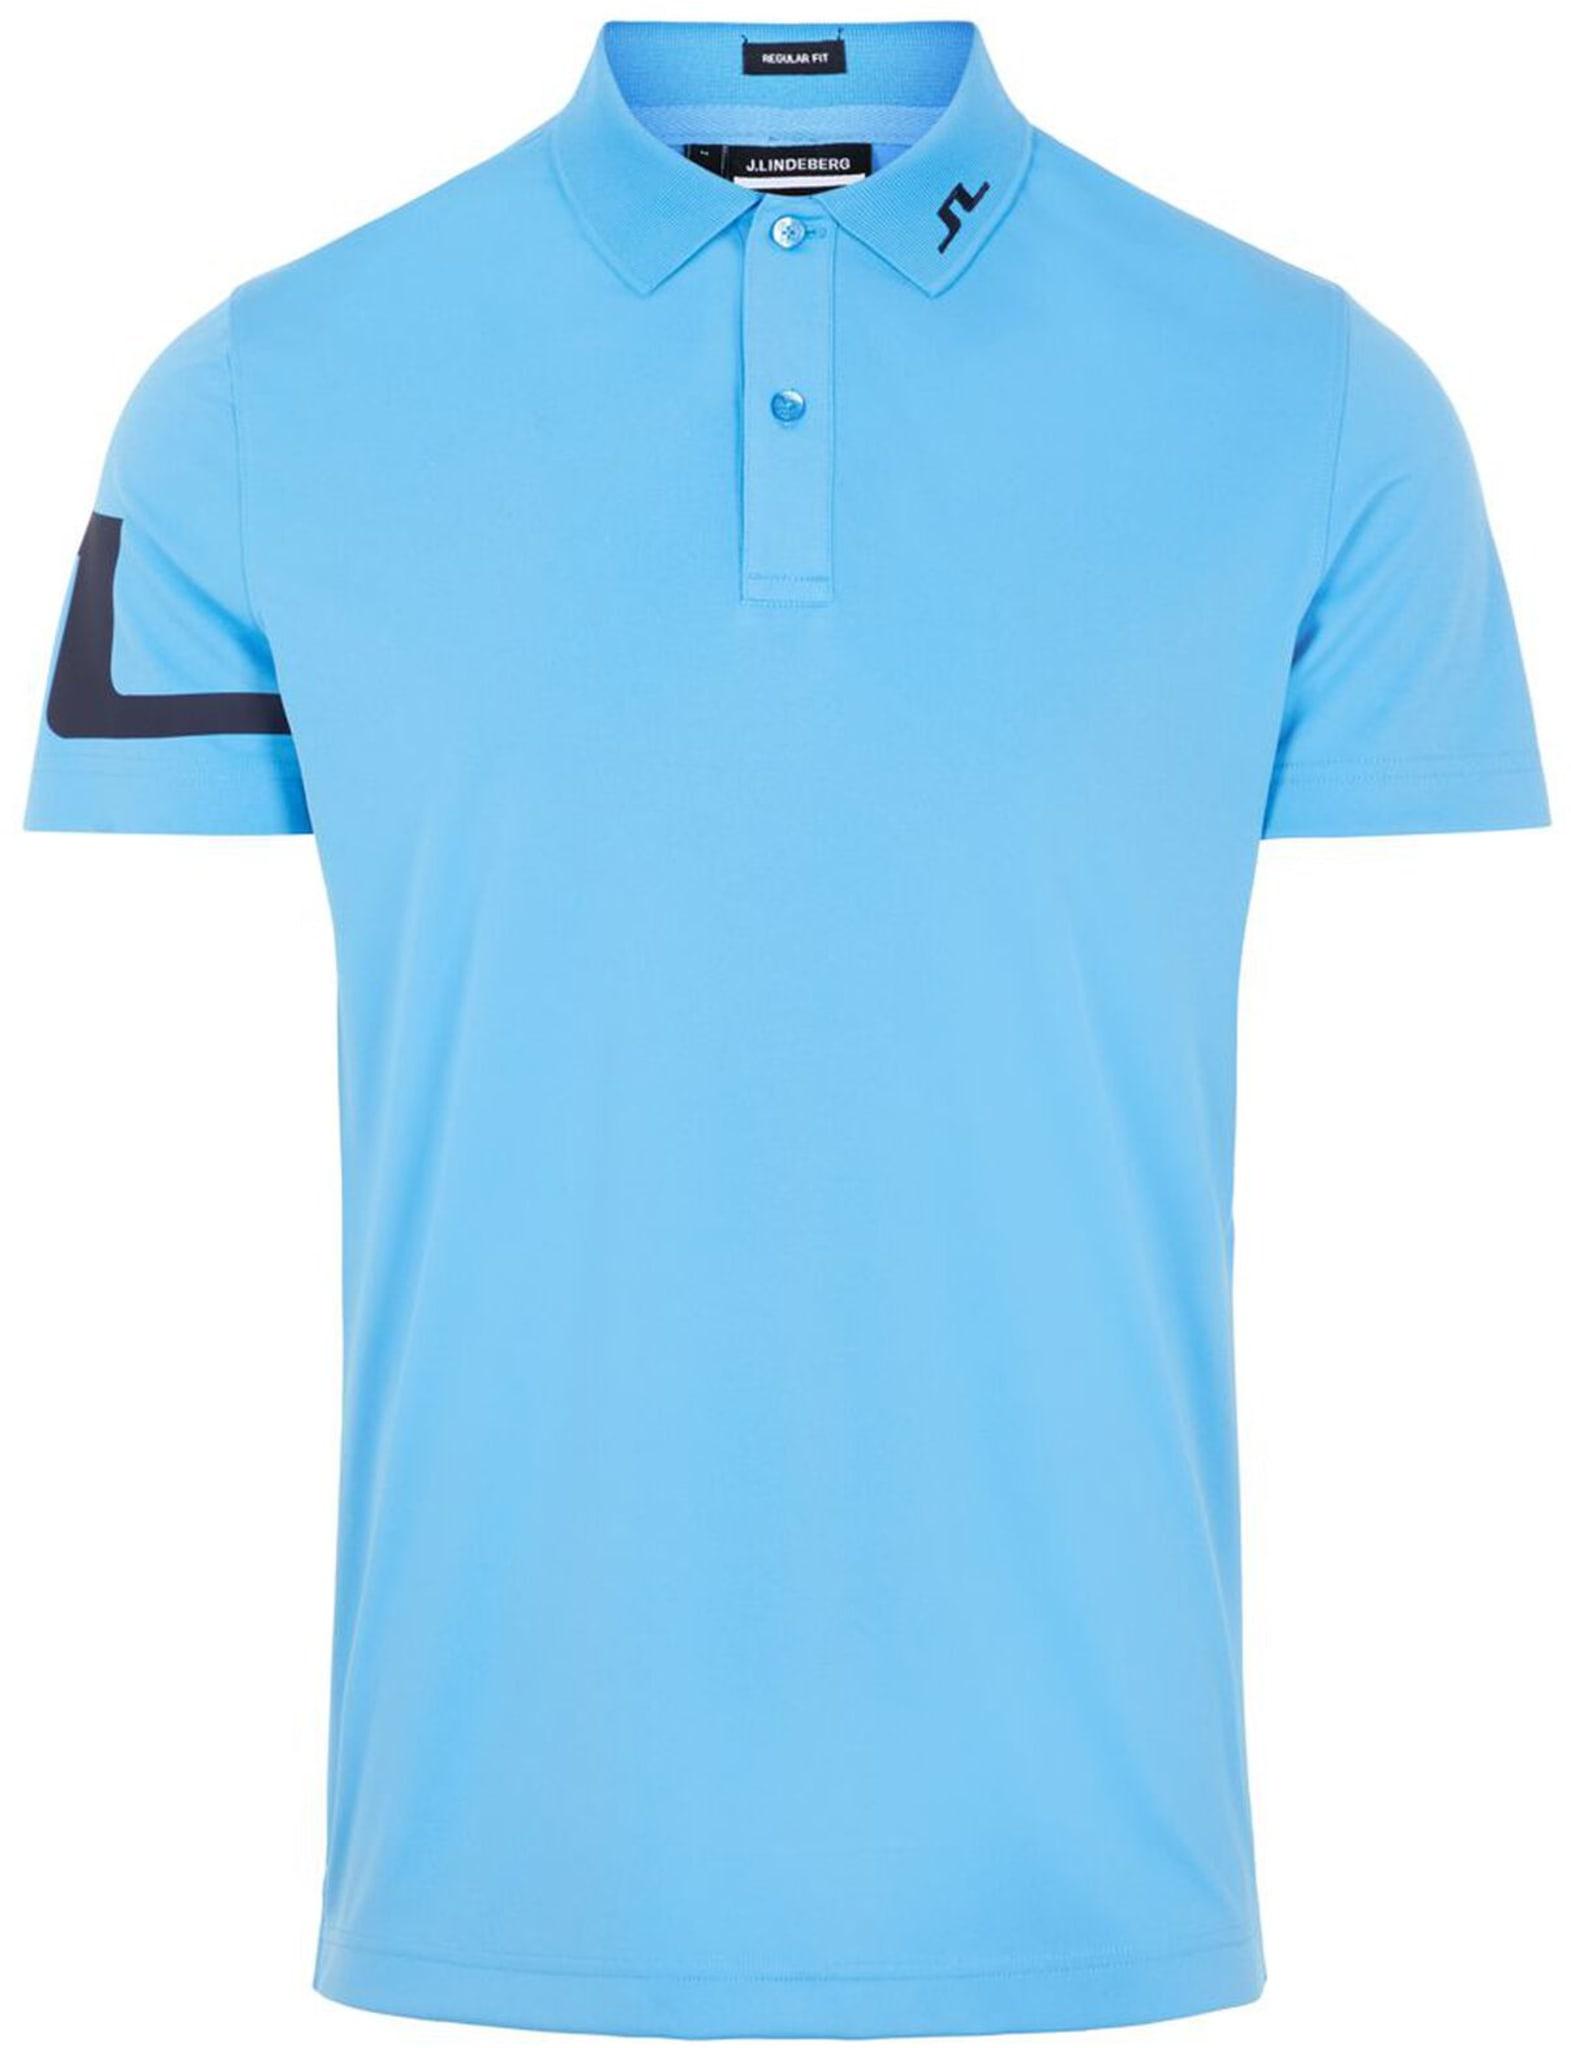 Heath Golf Polo M